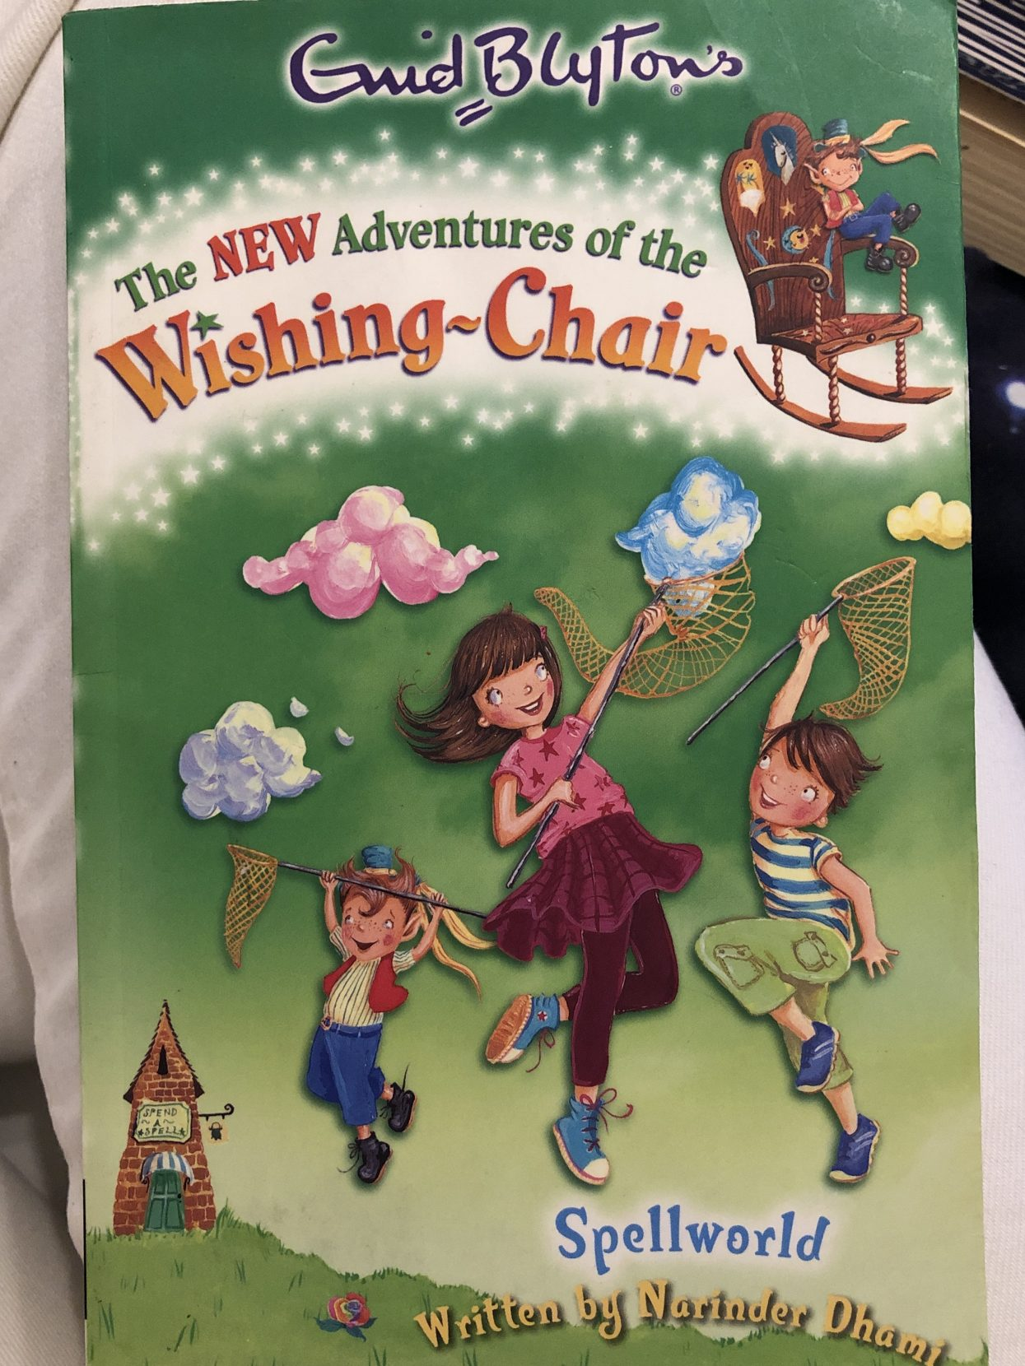 The Wishing-Chair